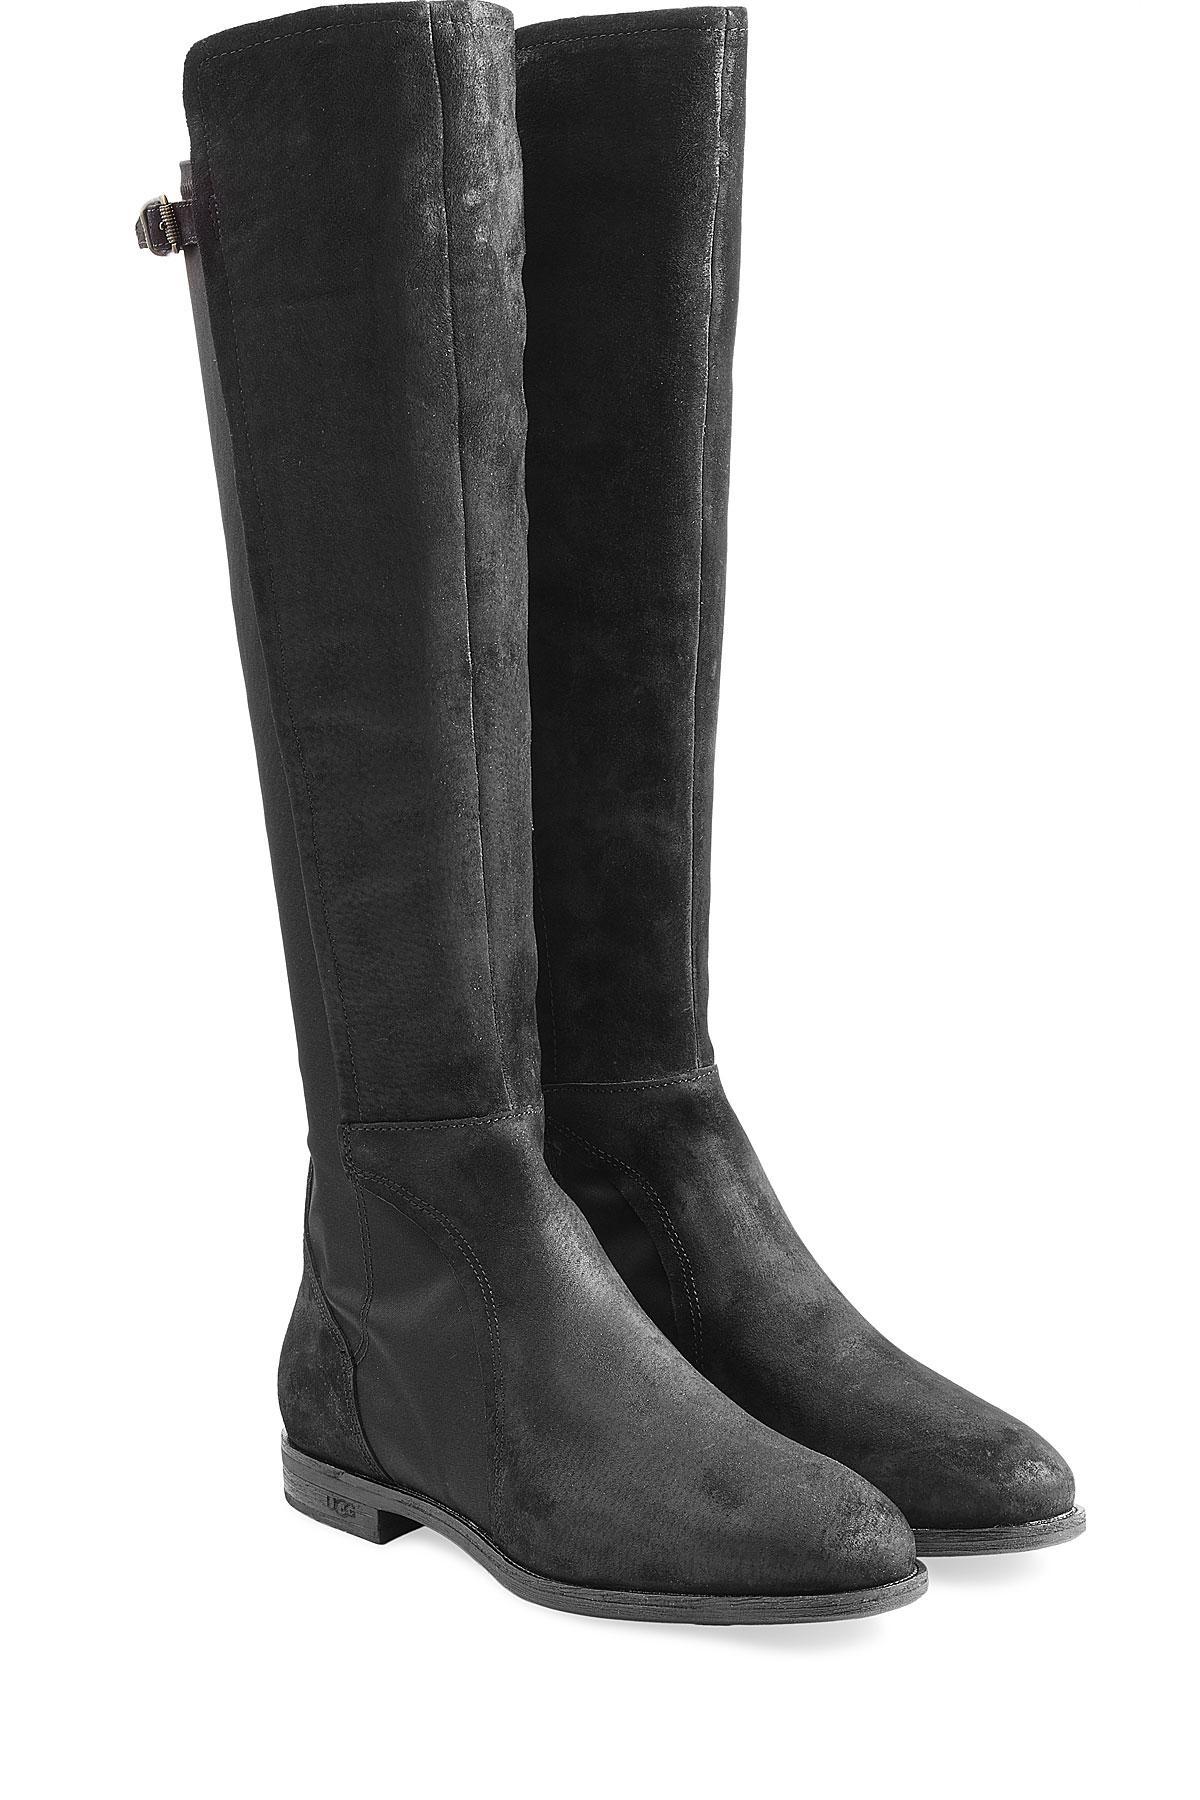 ugg danae suede knee boots black in black lyst